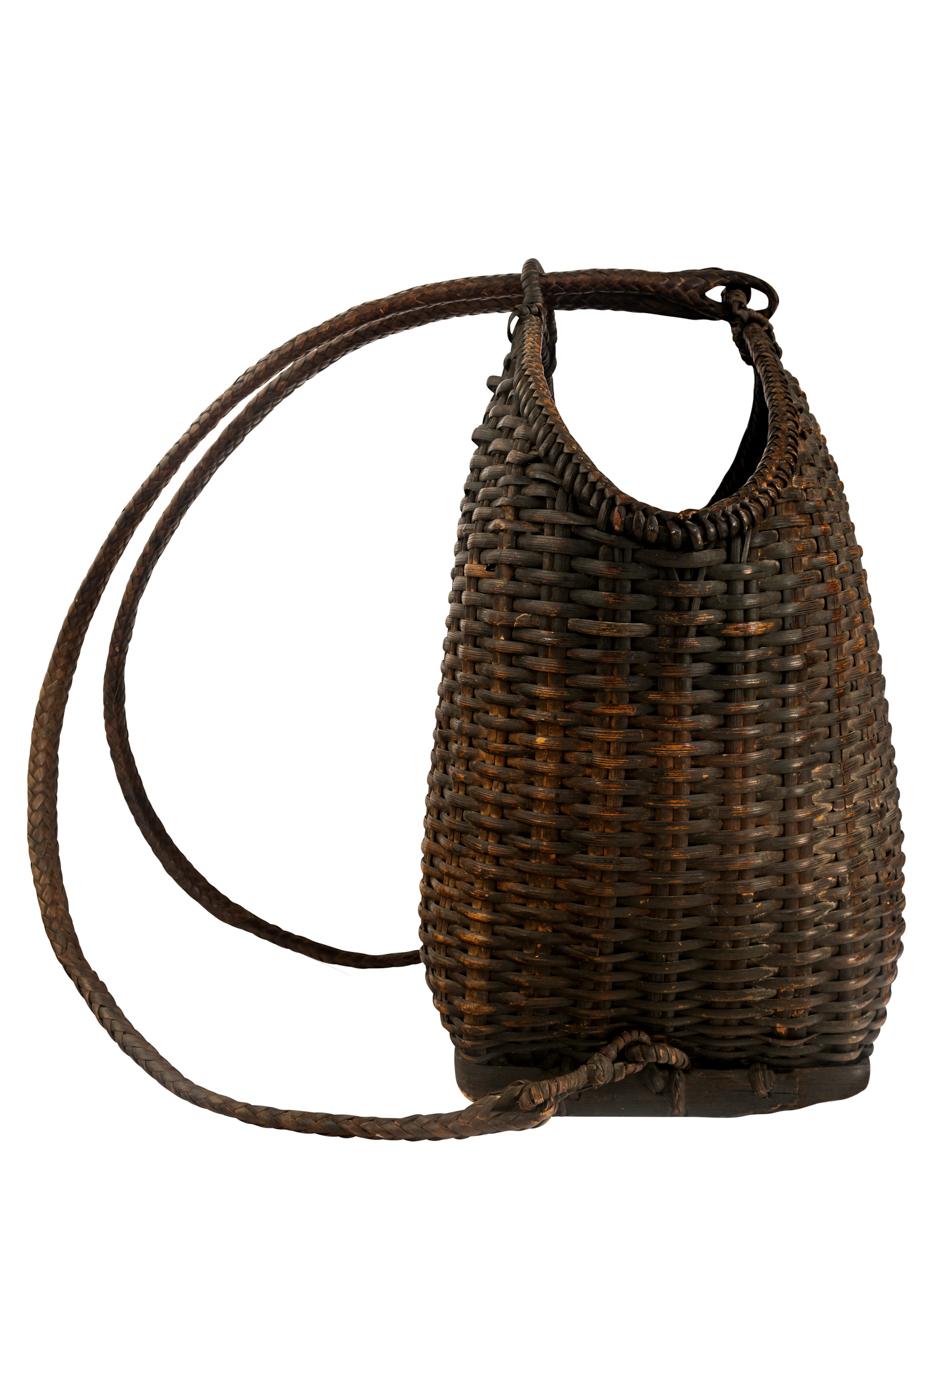 Canasto-mochila estilo vintage en rattan